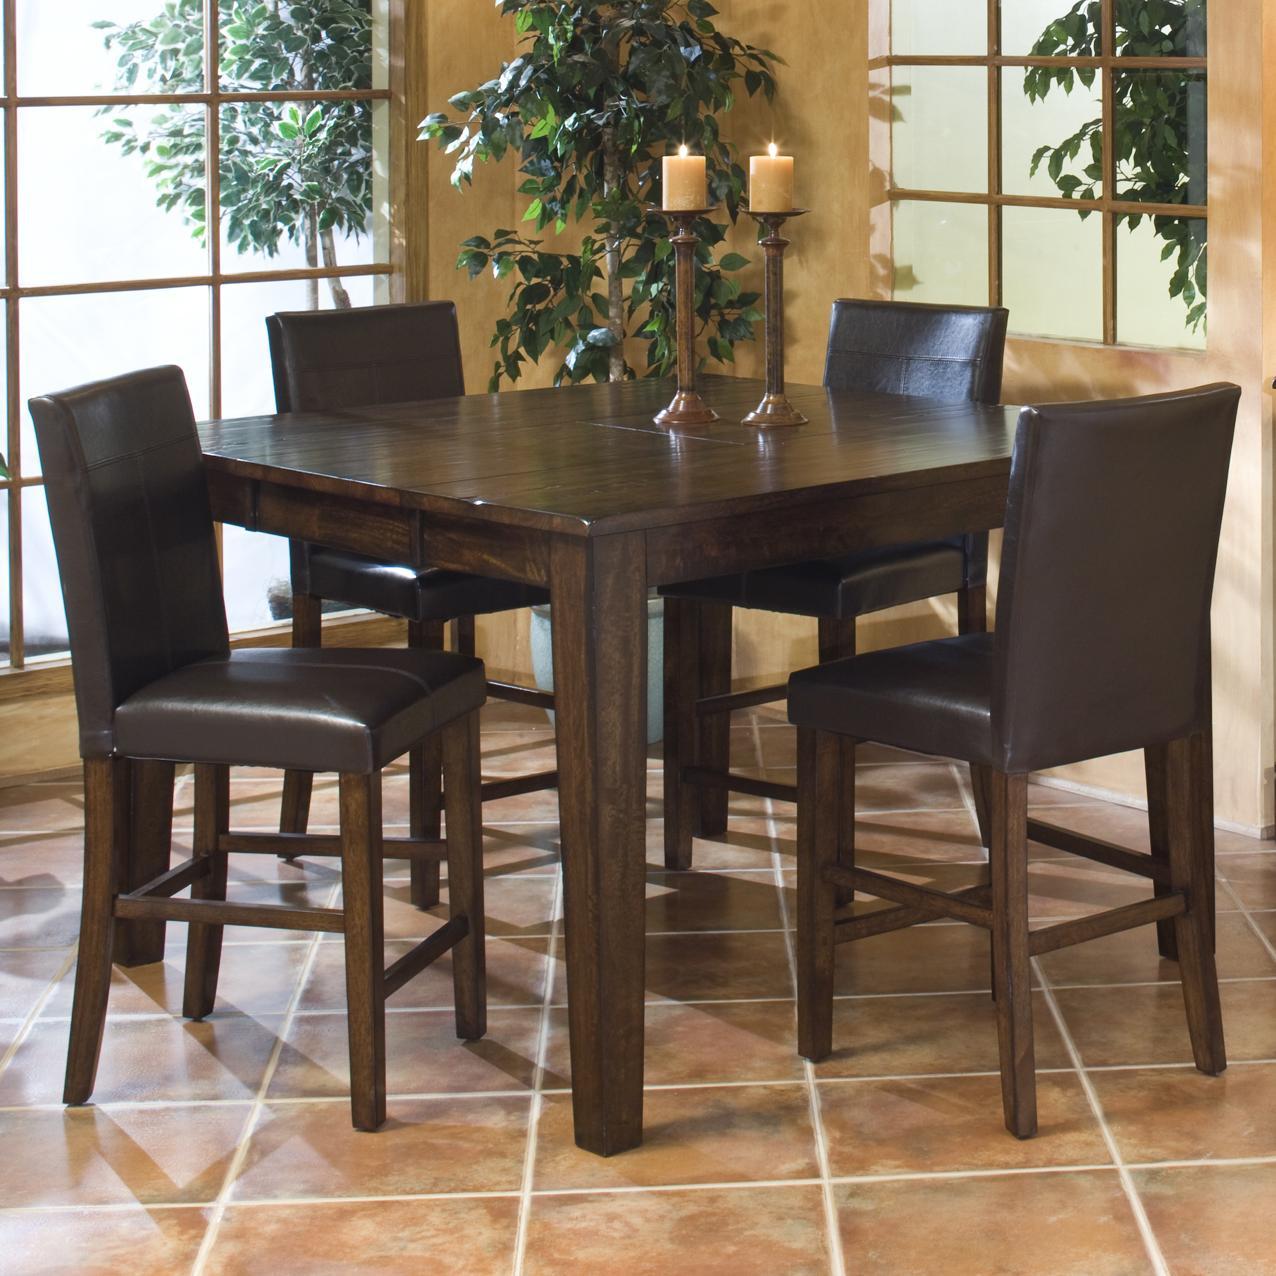 Belfort Select Cabin Creek Gathering Table with Parson's Barstools - Item Number: KA-TA-5454G-RAI-C+4xBS-280L-RAI-K24